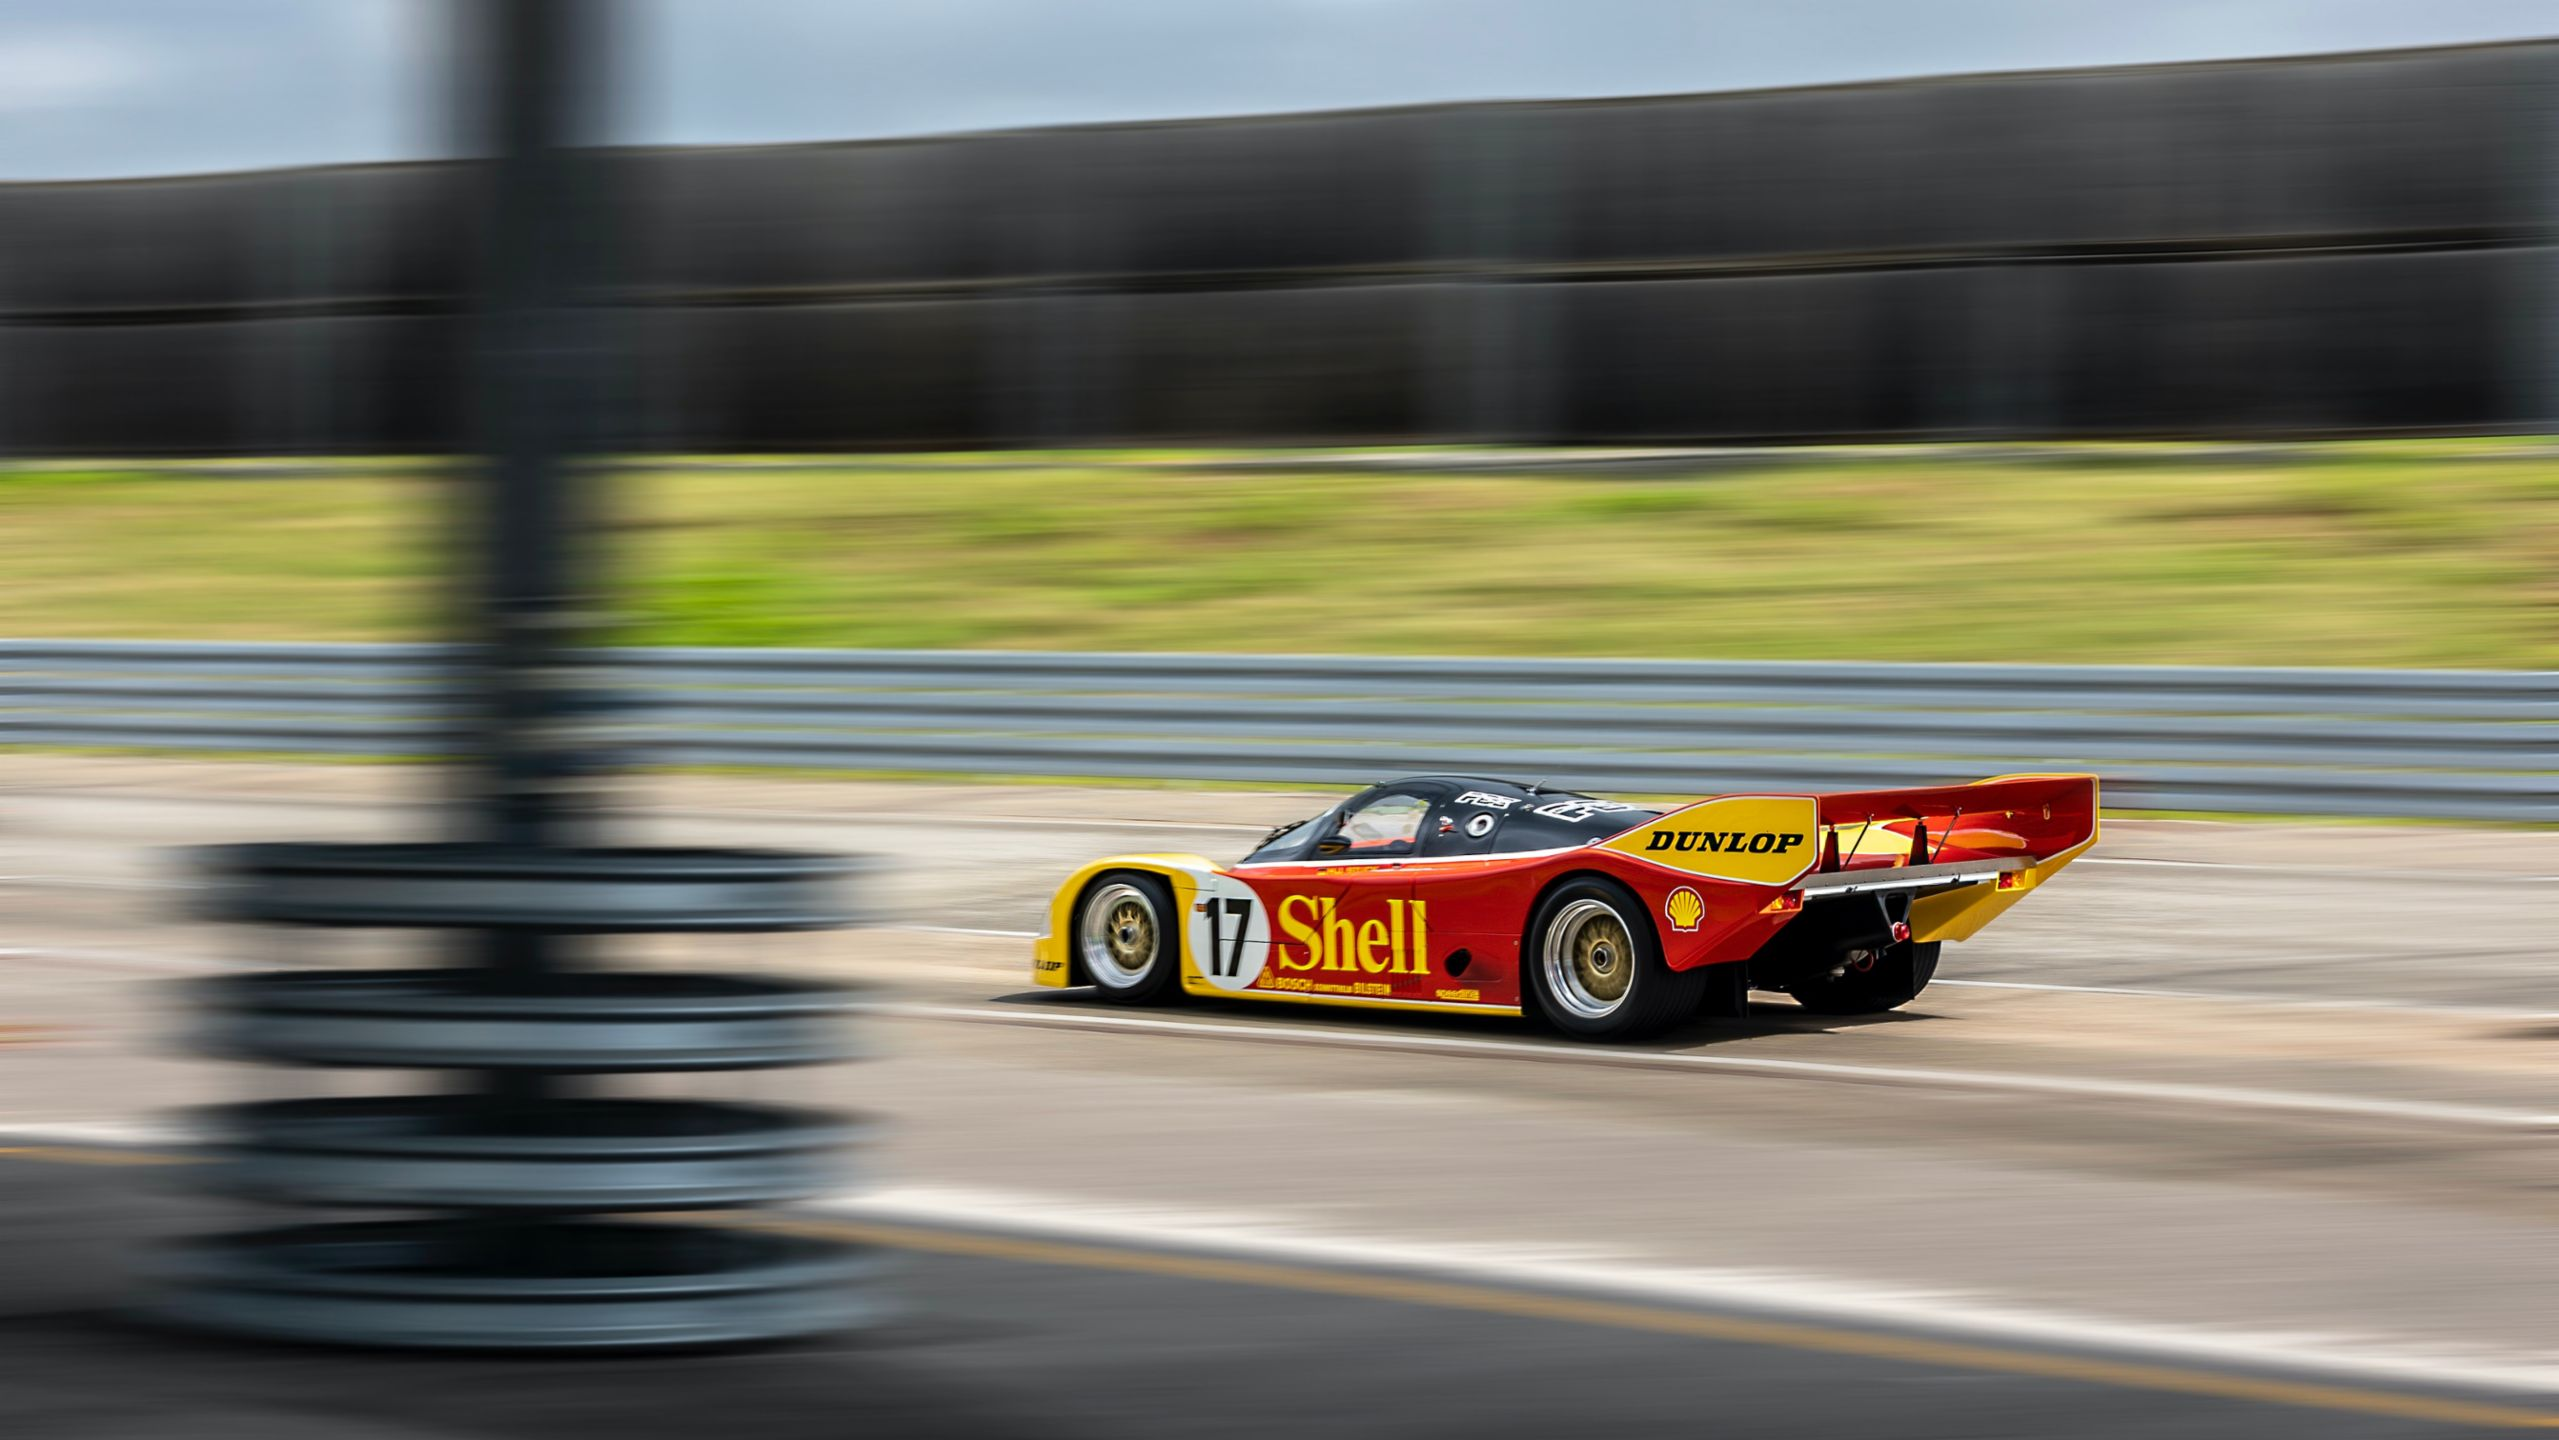 Porsche Restores a 1987 962C Race Car to Factory Original Condition